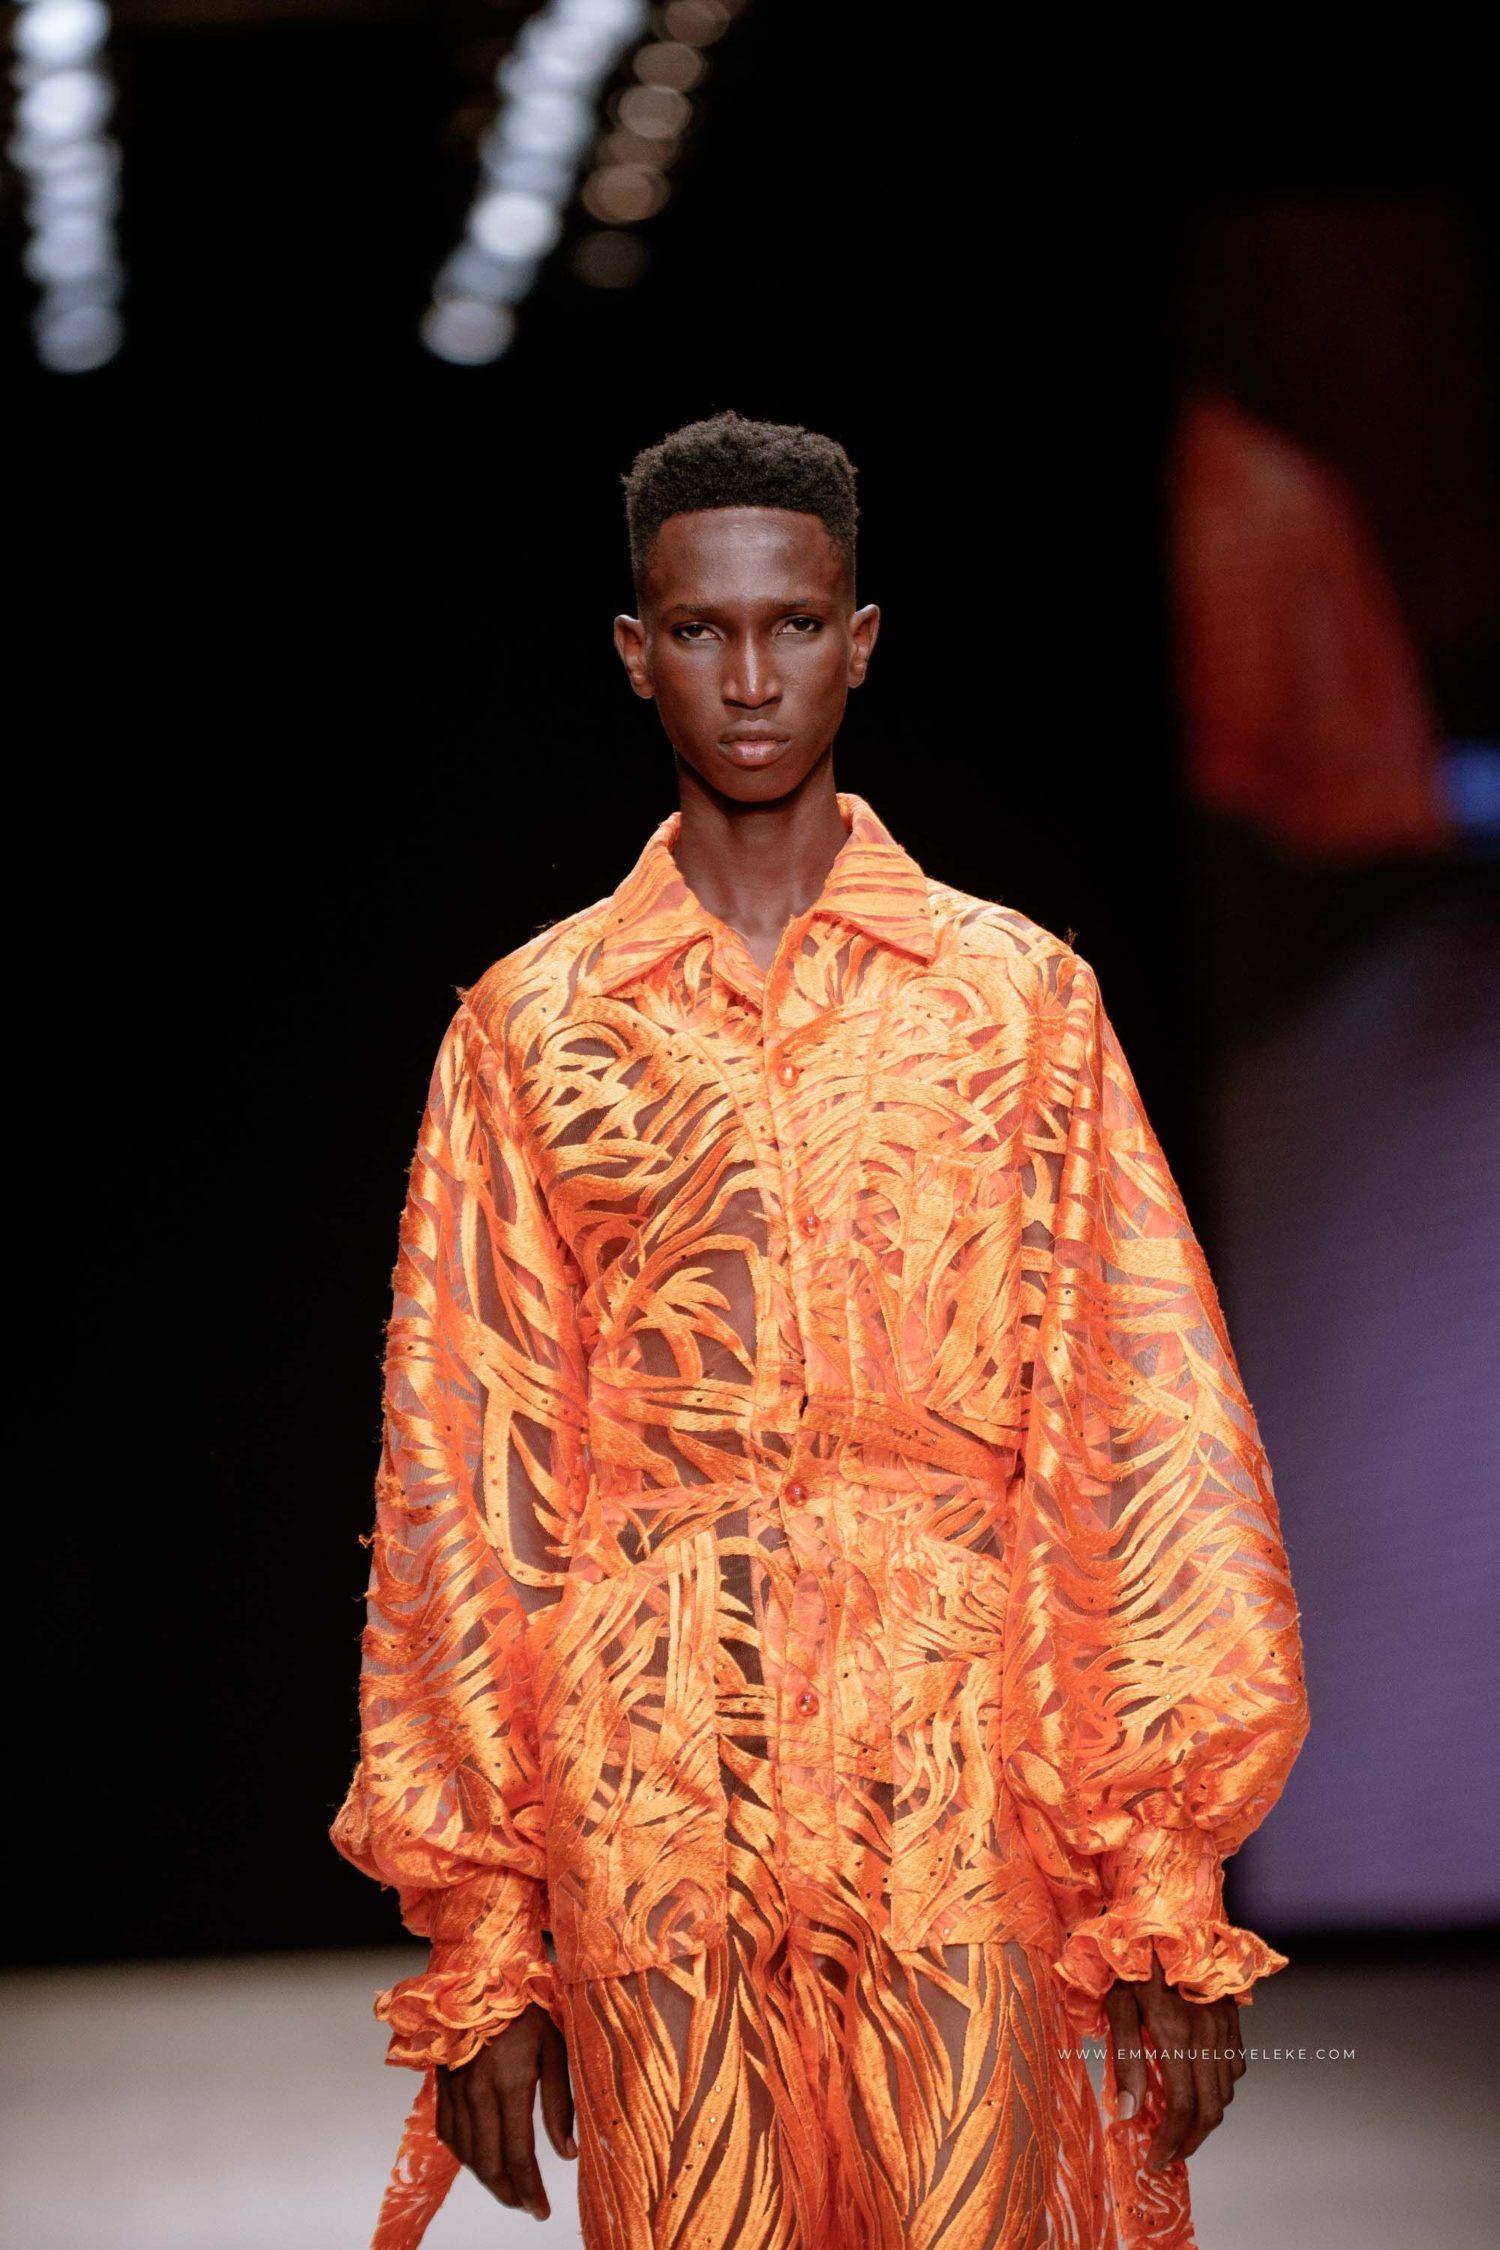 ARISE Fashion Week 2019 | Selam Fessahaye